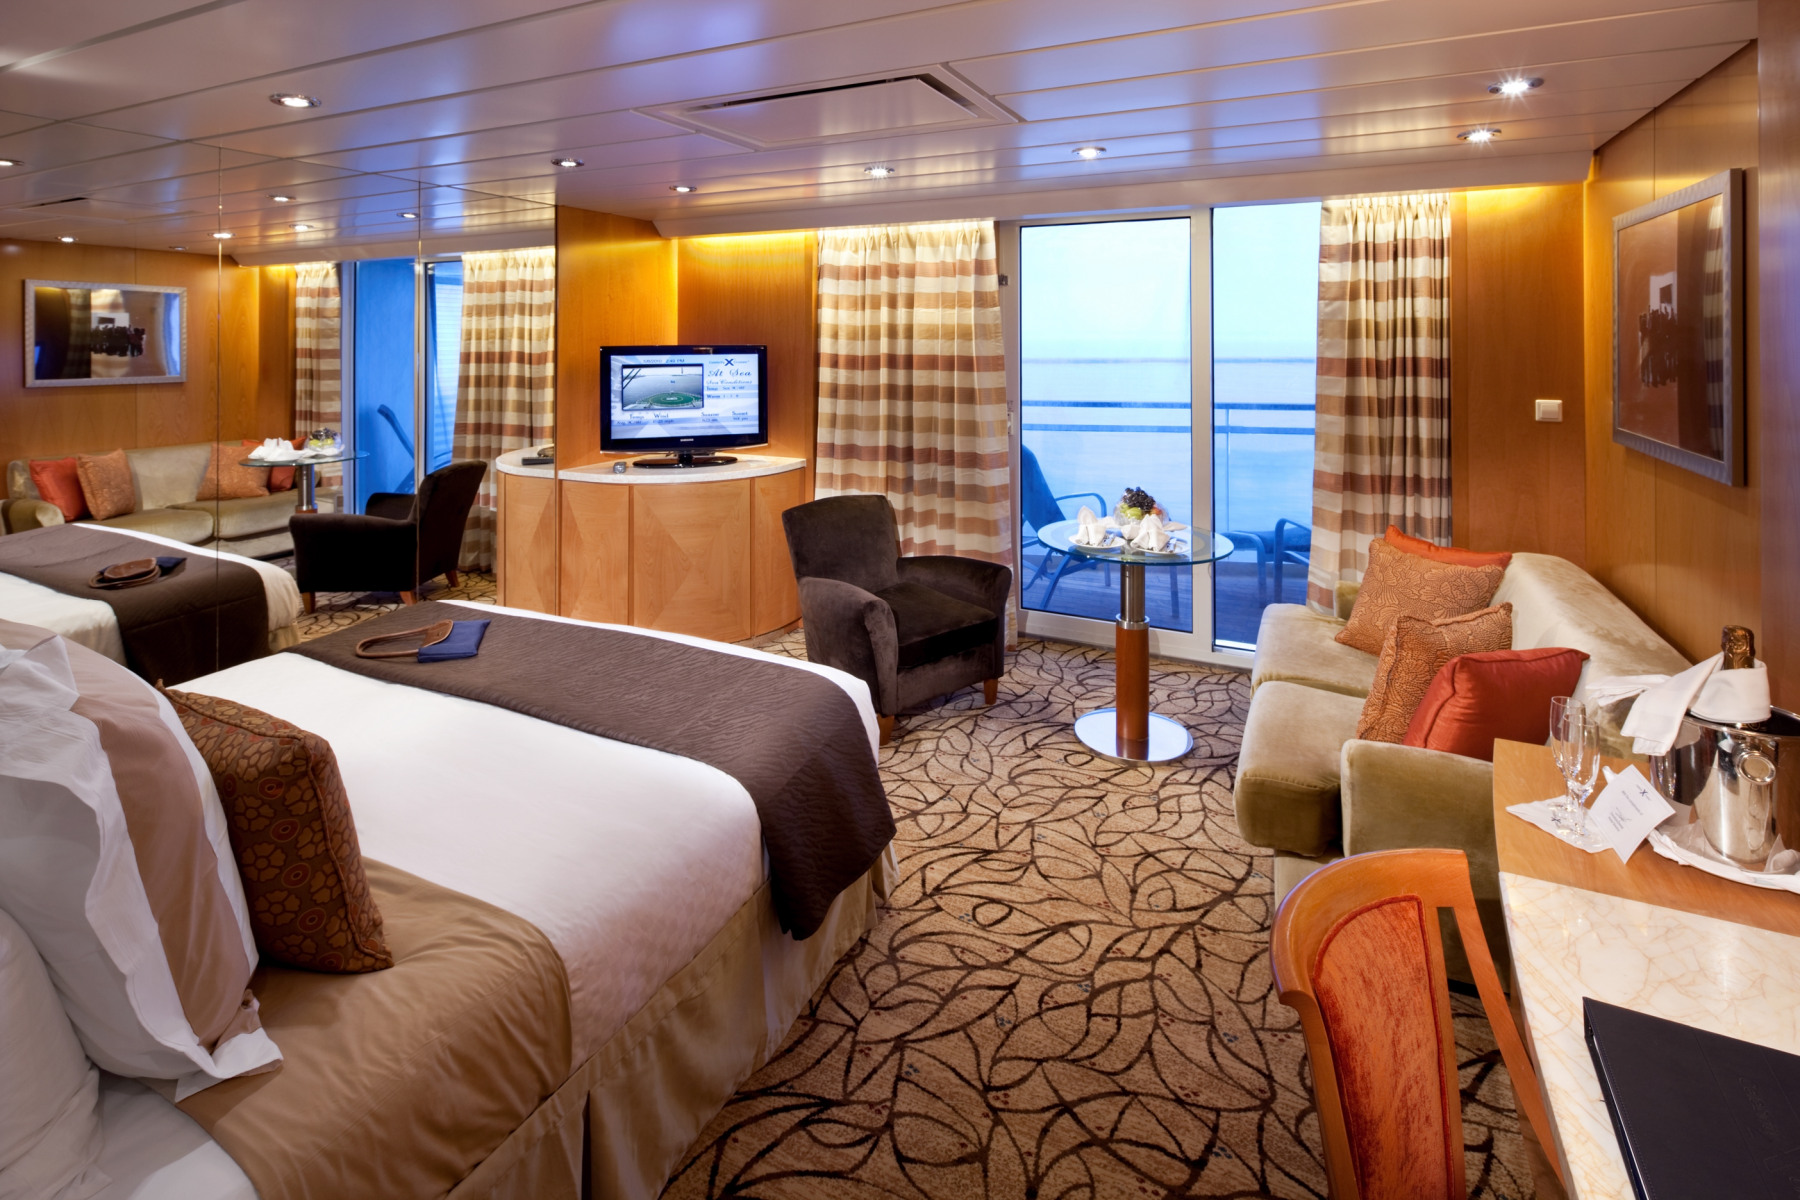 celebrity cruises celebrity constellation sky suite.jpg